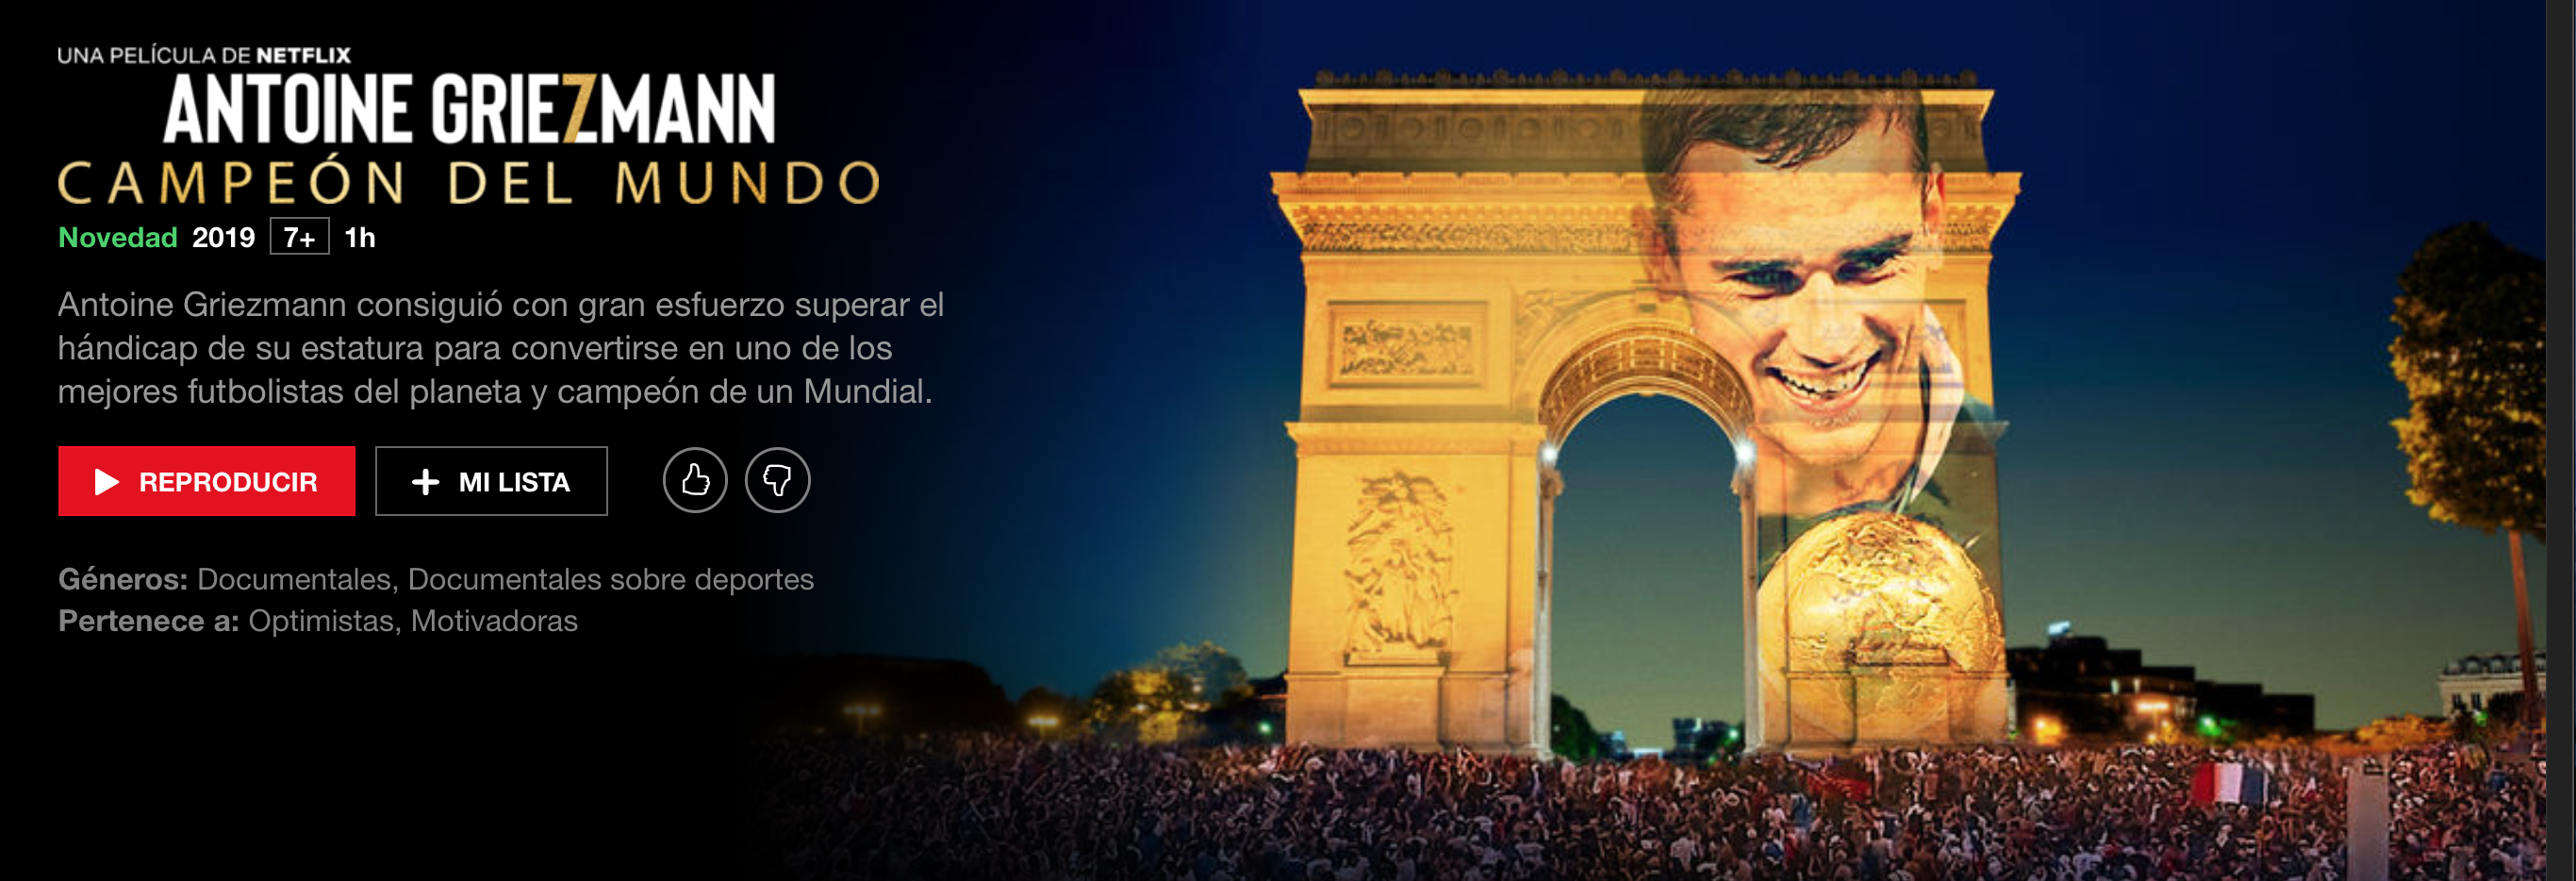 "VIDEO: Netflix emite desde hoy este documental de Griezmann: ""Amo el club"" 1"